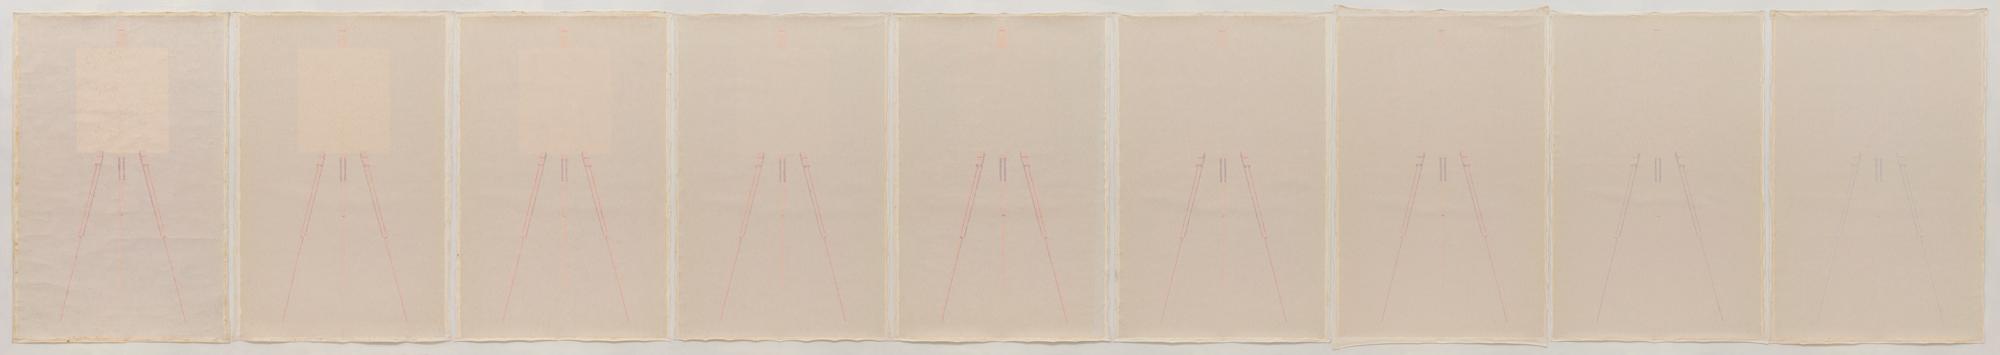 Ignazio Gadaleta, 1980, Mimesis, olio su tela, 150 x 900 cm ∼ | Milano, Intesa Sanpaolo, Caveau delle Gallerie d'Italia - Piazza Scala